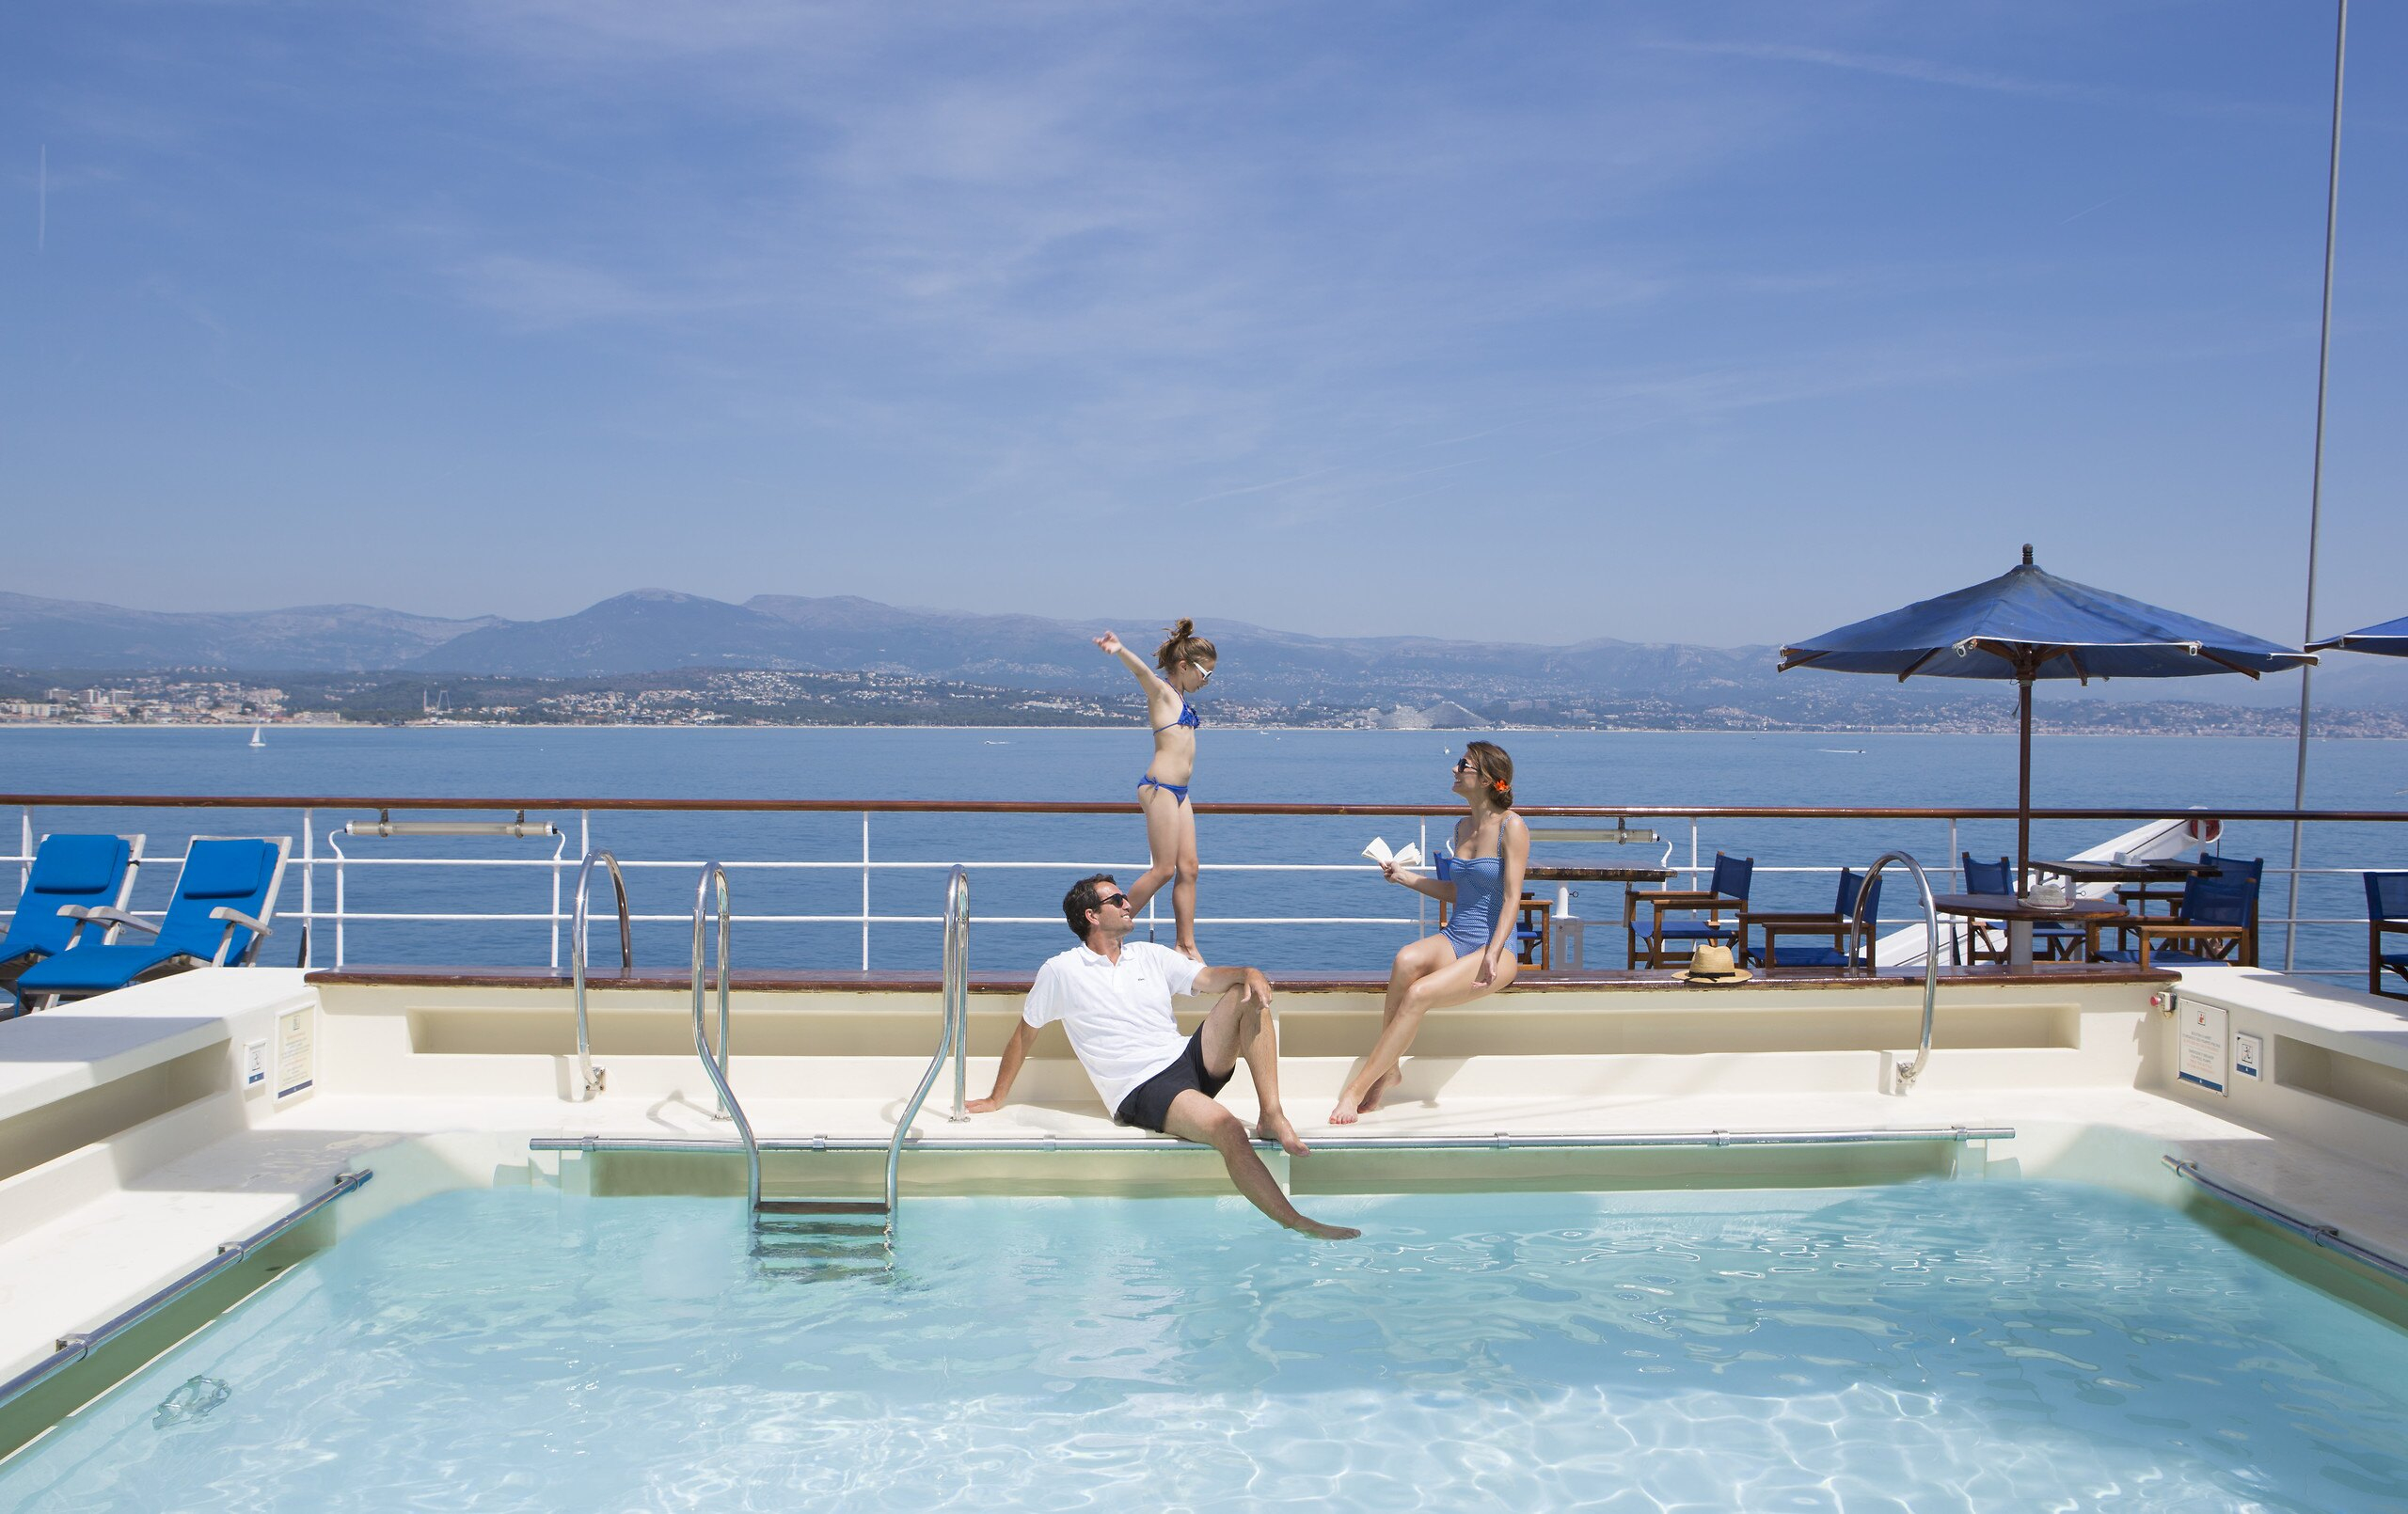 Club Med 2 Cruise Yelkenli | Her Şey Dahil Gemi Ile Yaz Tatili à Freedom Piscine